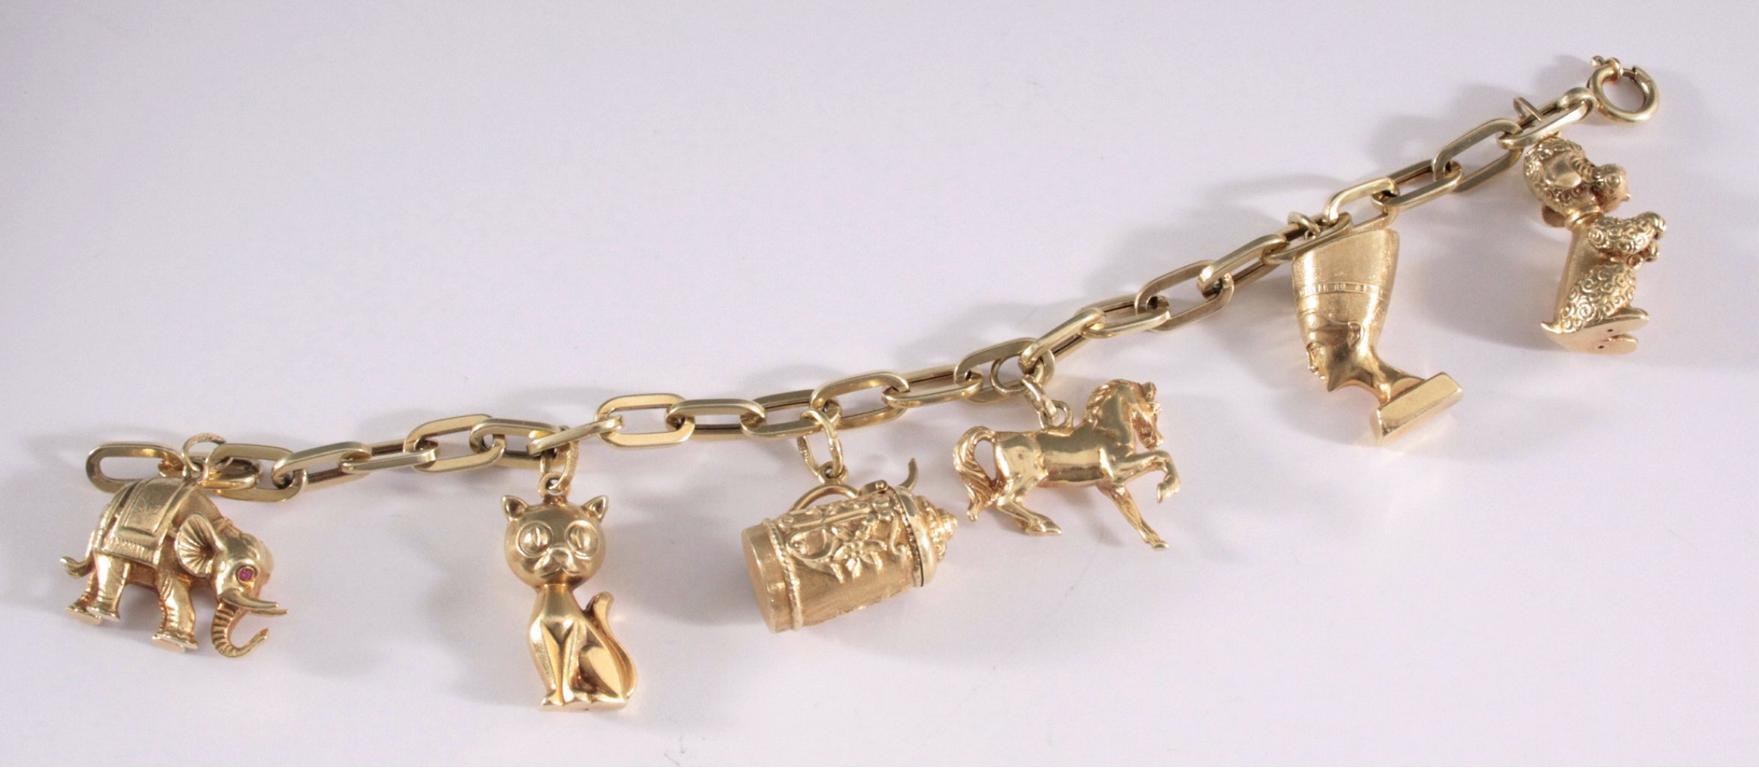 Bettelarmband aus 14 Karat Gelbgold-2